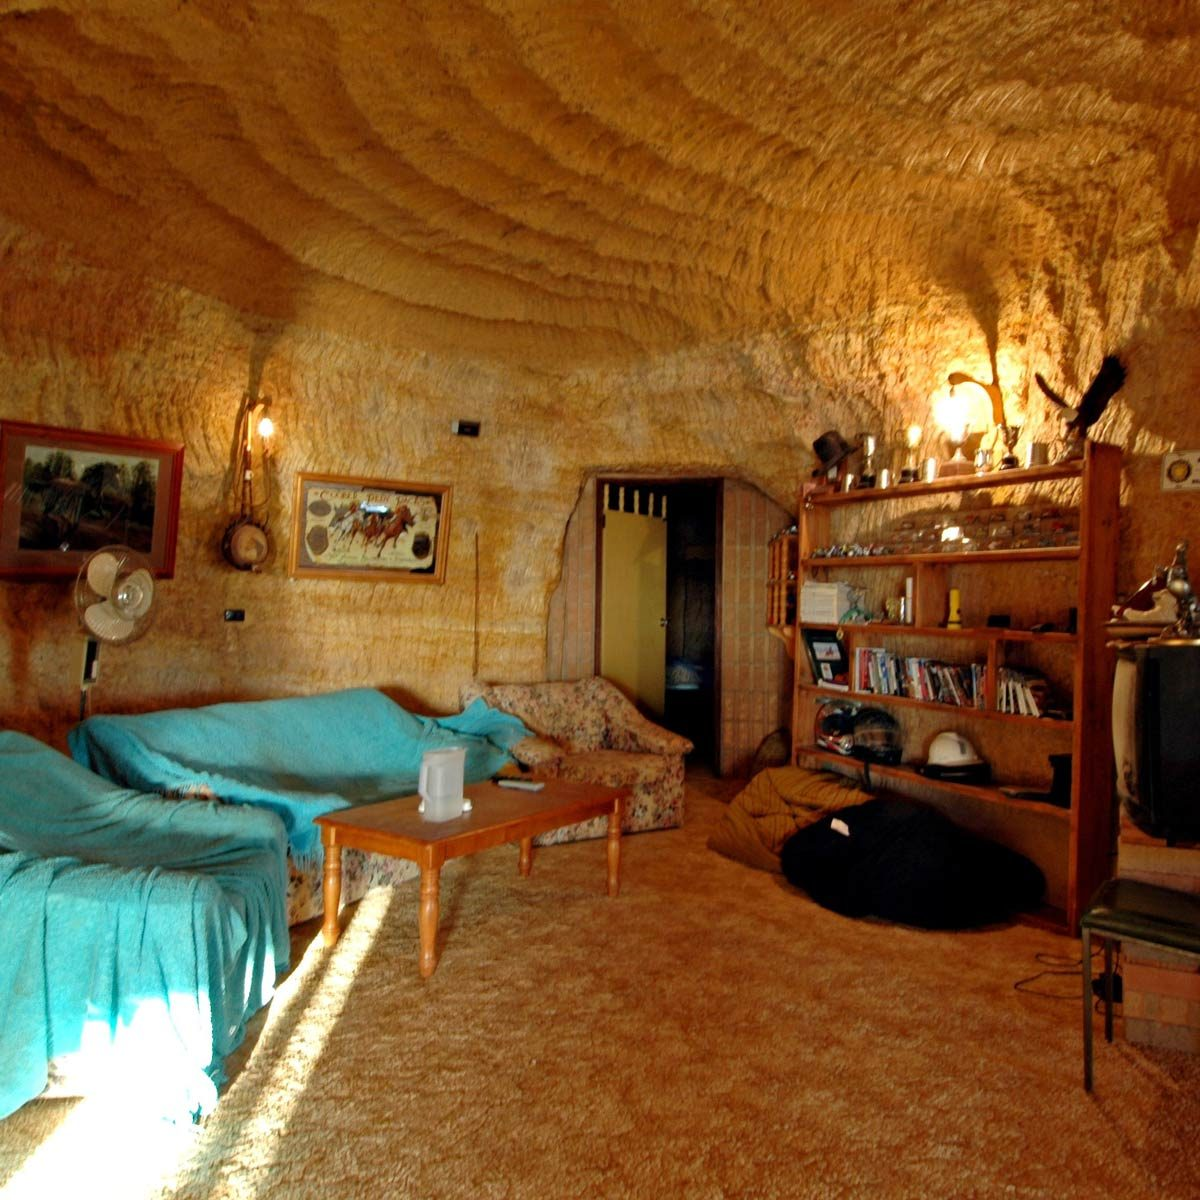 Underground-home-in-mining-town-of-Coober-Pedy-Australia